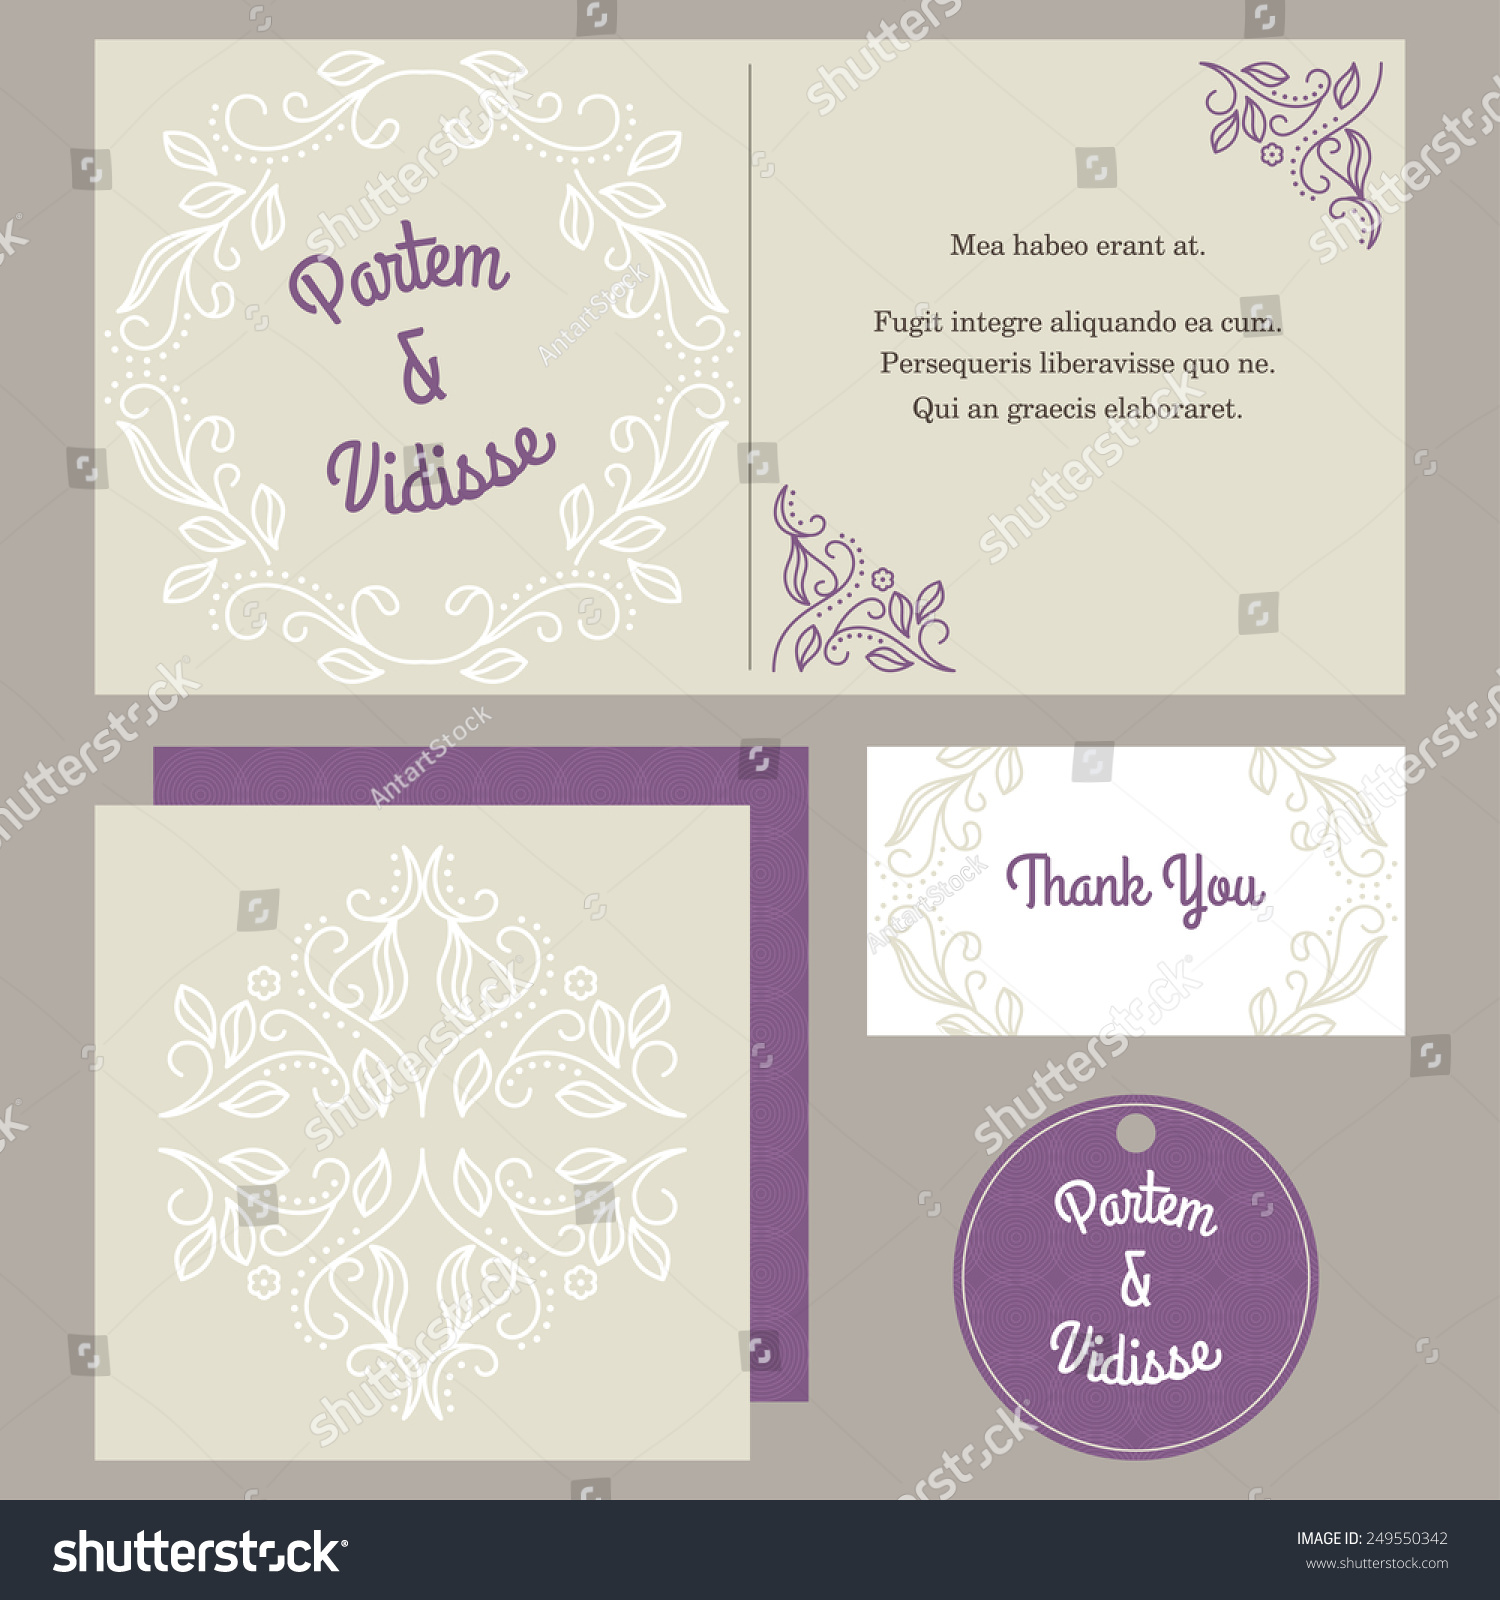 Vector Design Template Wedding Invitation Envelope Stock Vector ...